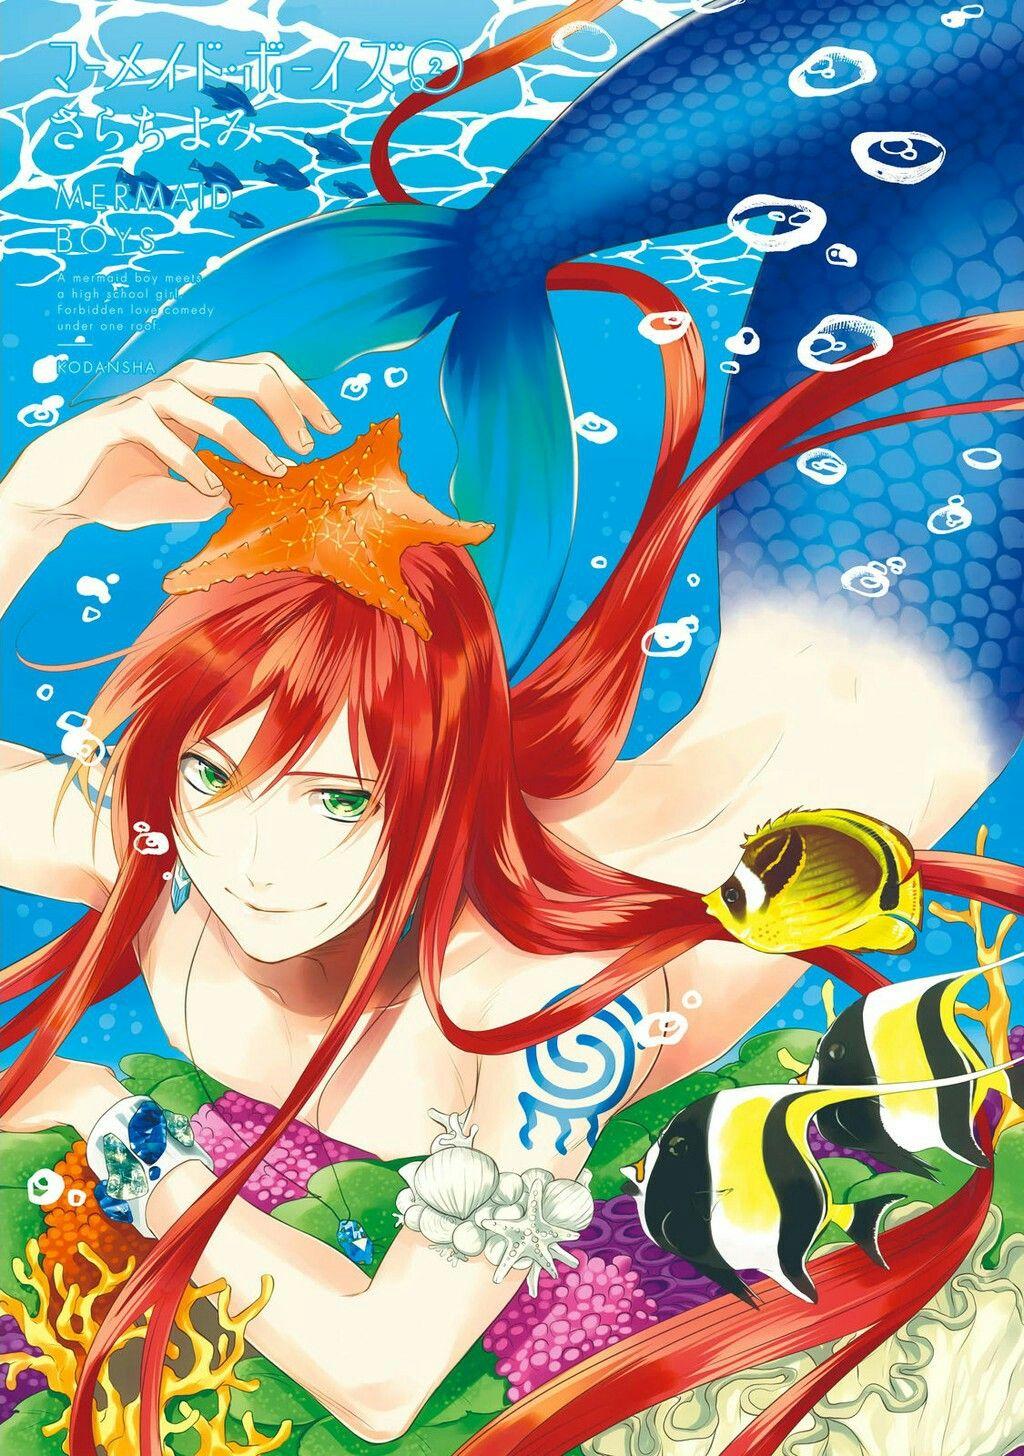 Mangá Mermaid boys Naru